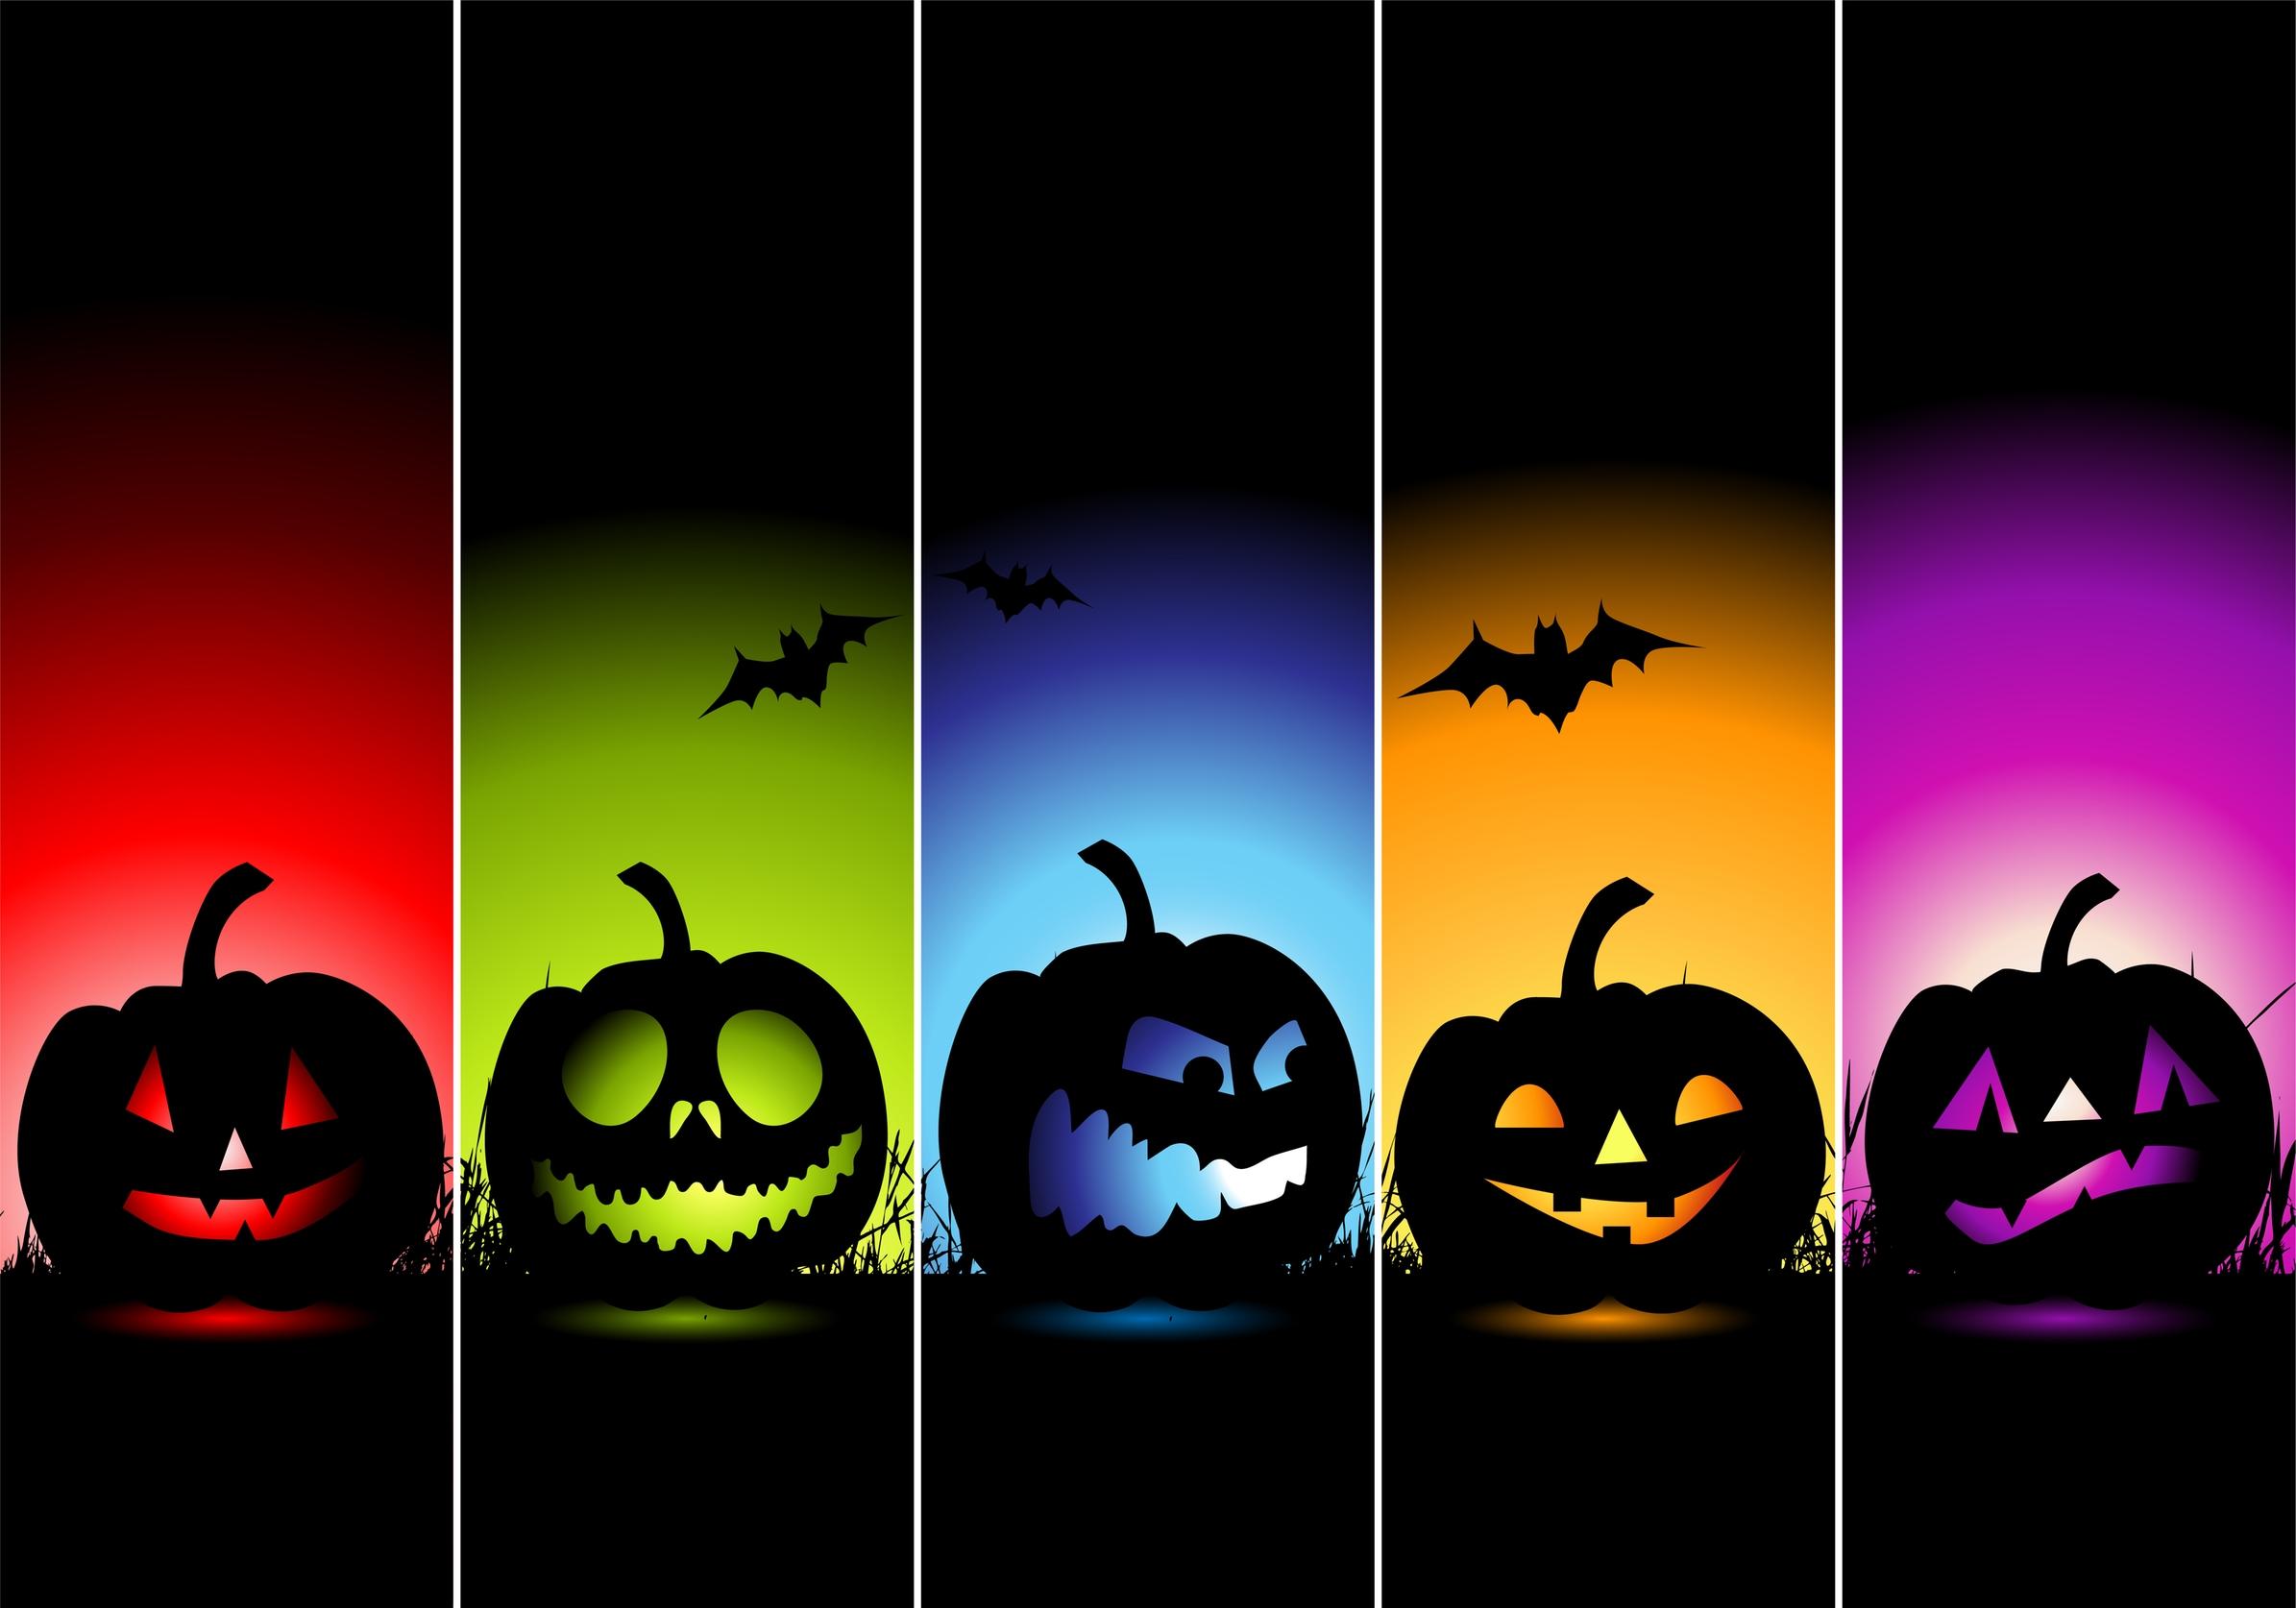 Best Halloween Wallpapers, Graphics and Vectors By Depositphotos